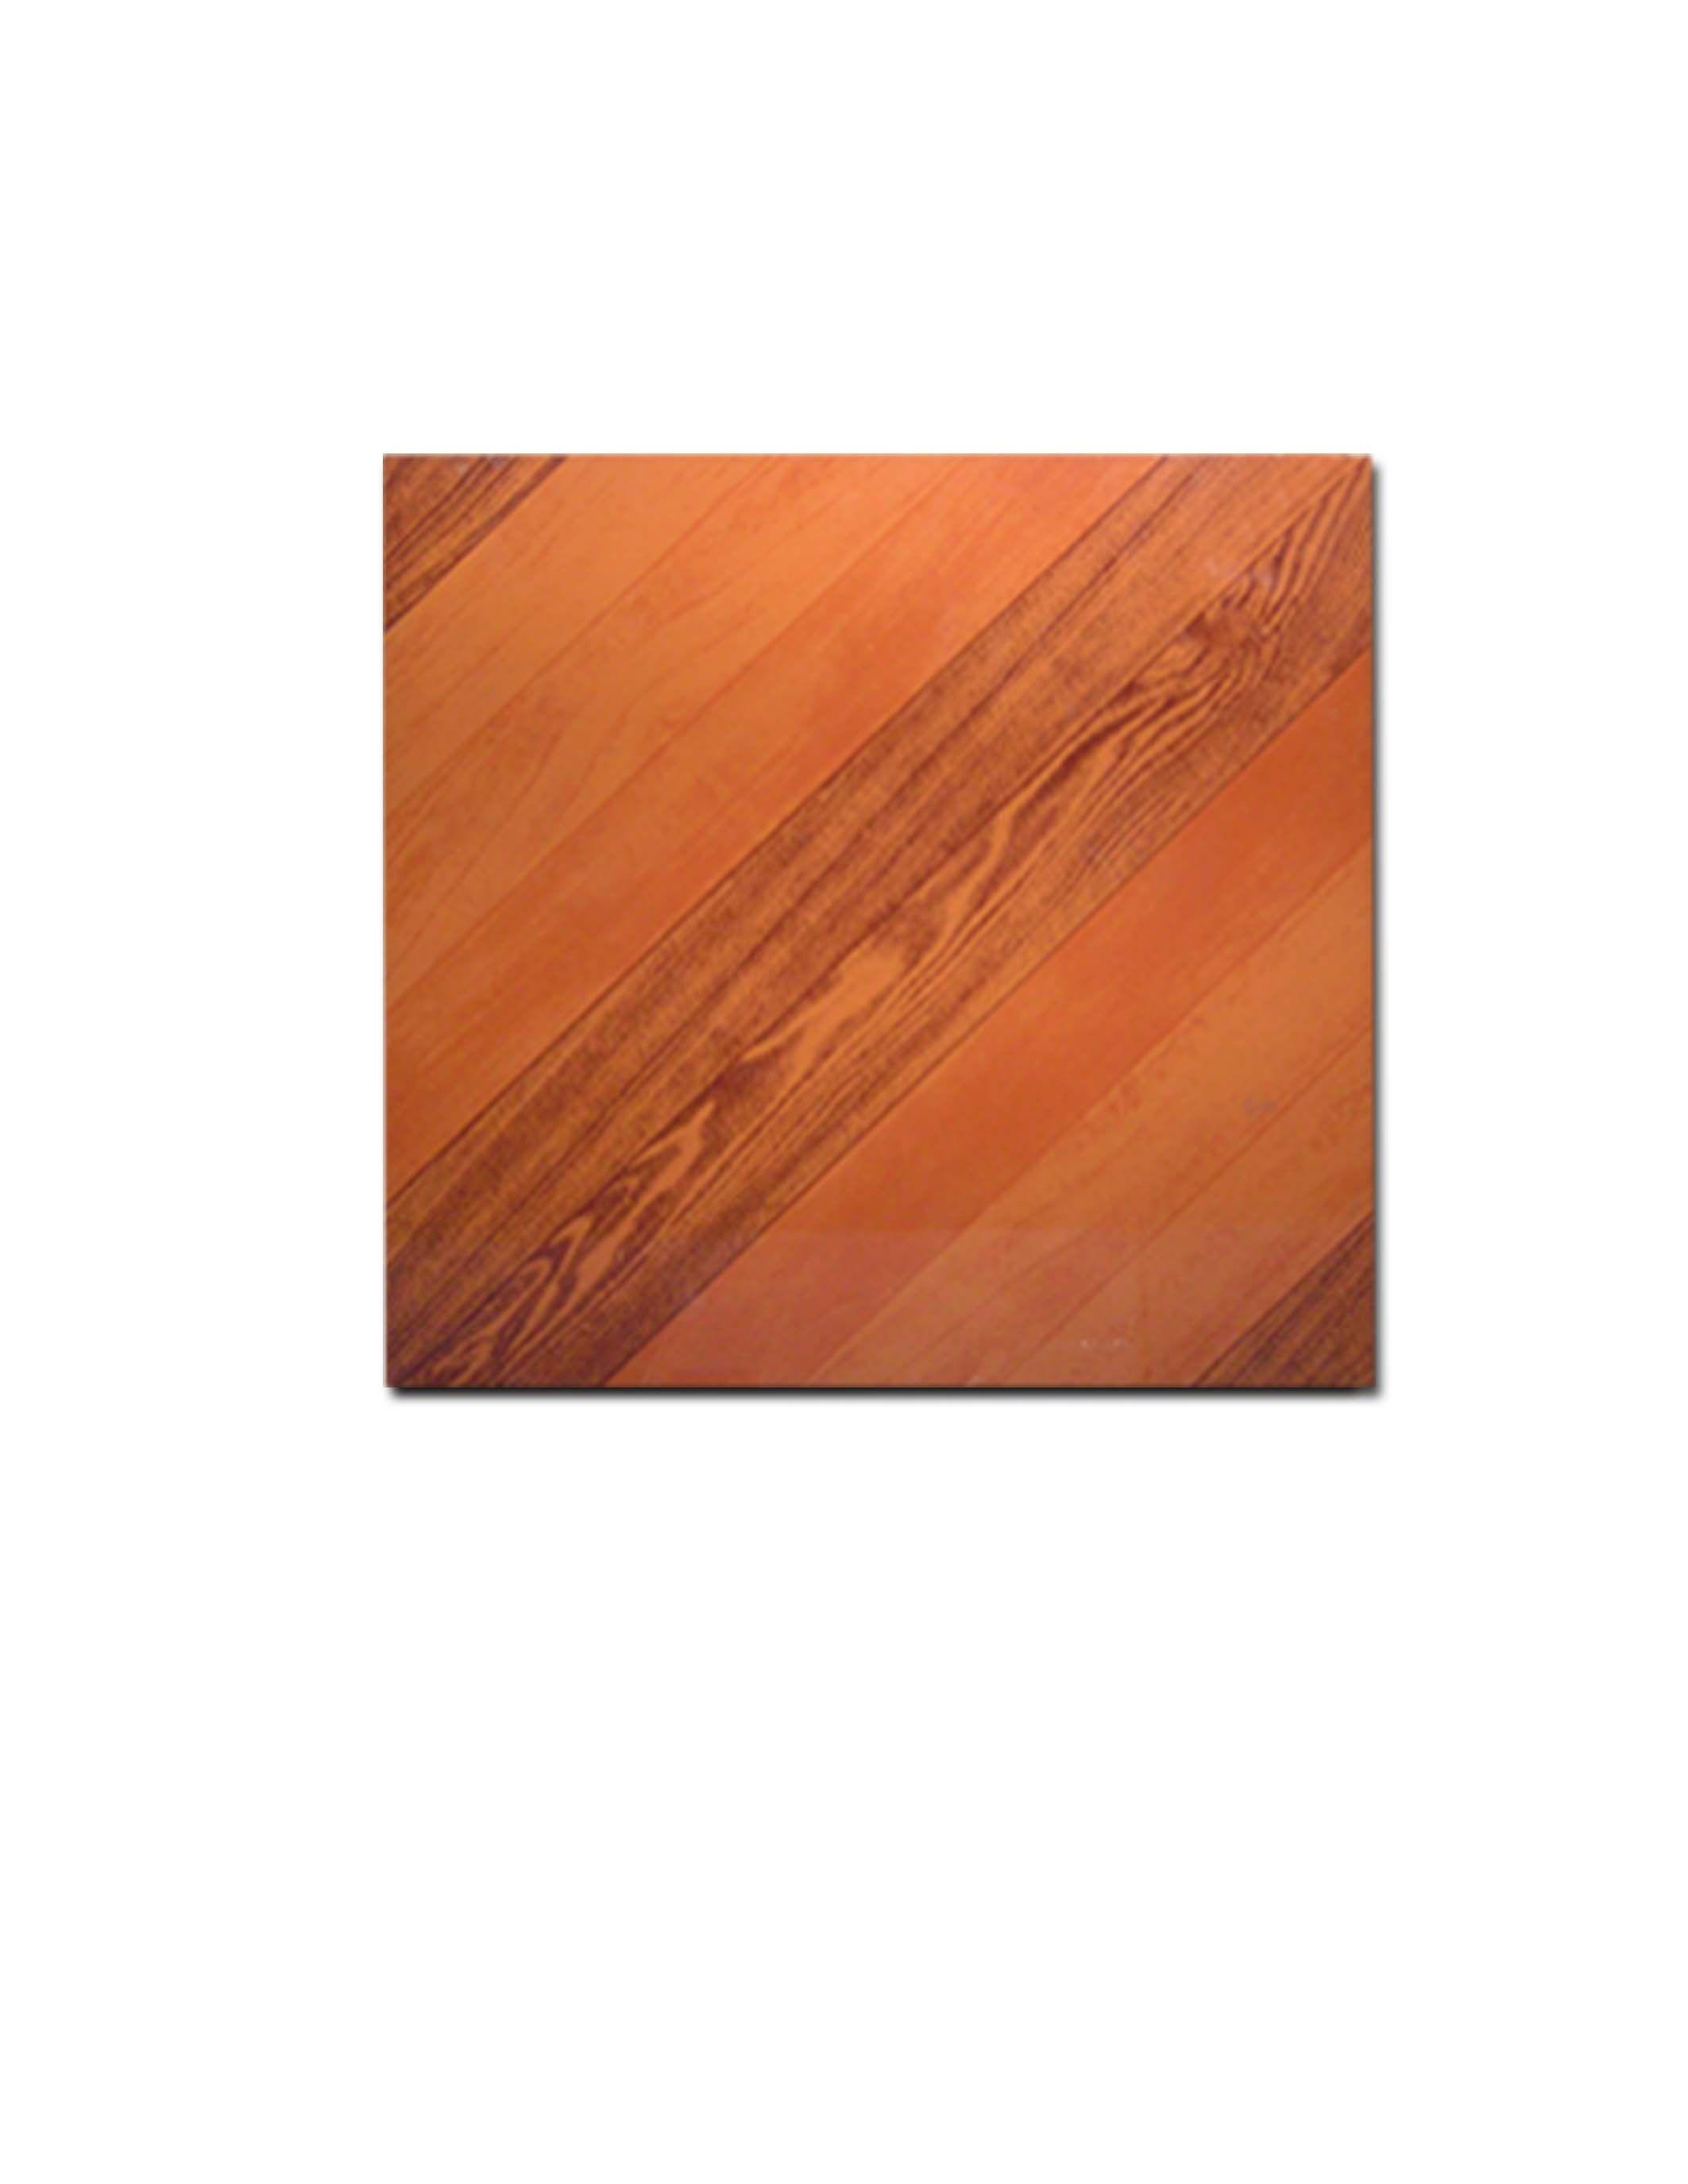 Mariwasa floor tiles 1616 httpnextsoft21 pinterest mariwasa floor tiles 1616 dailygadgetfo Choice Image